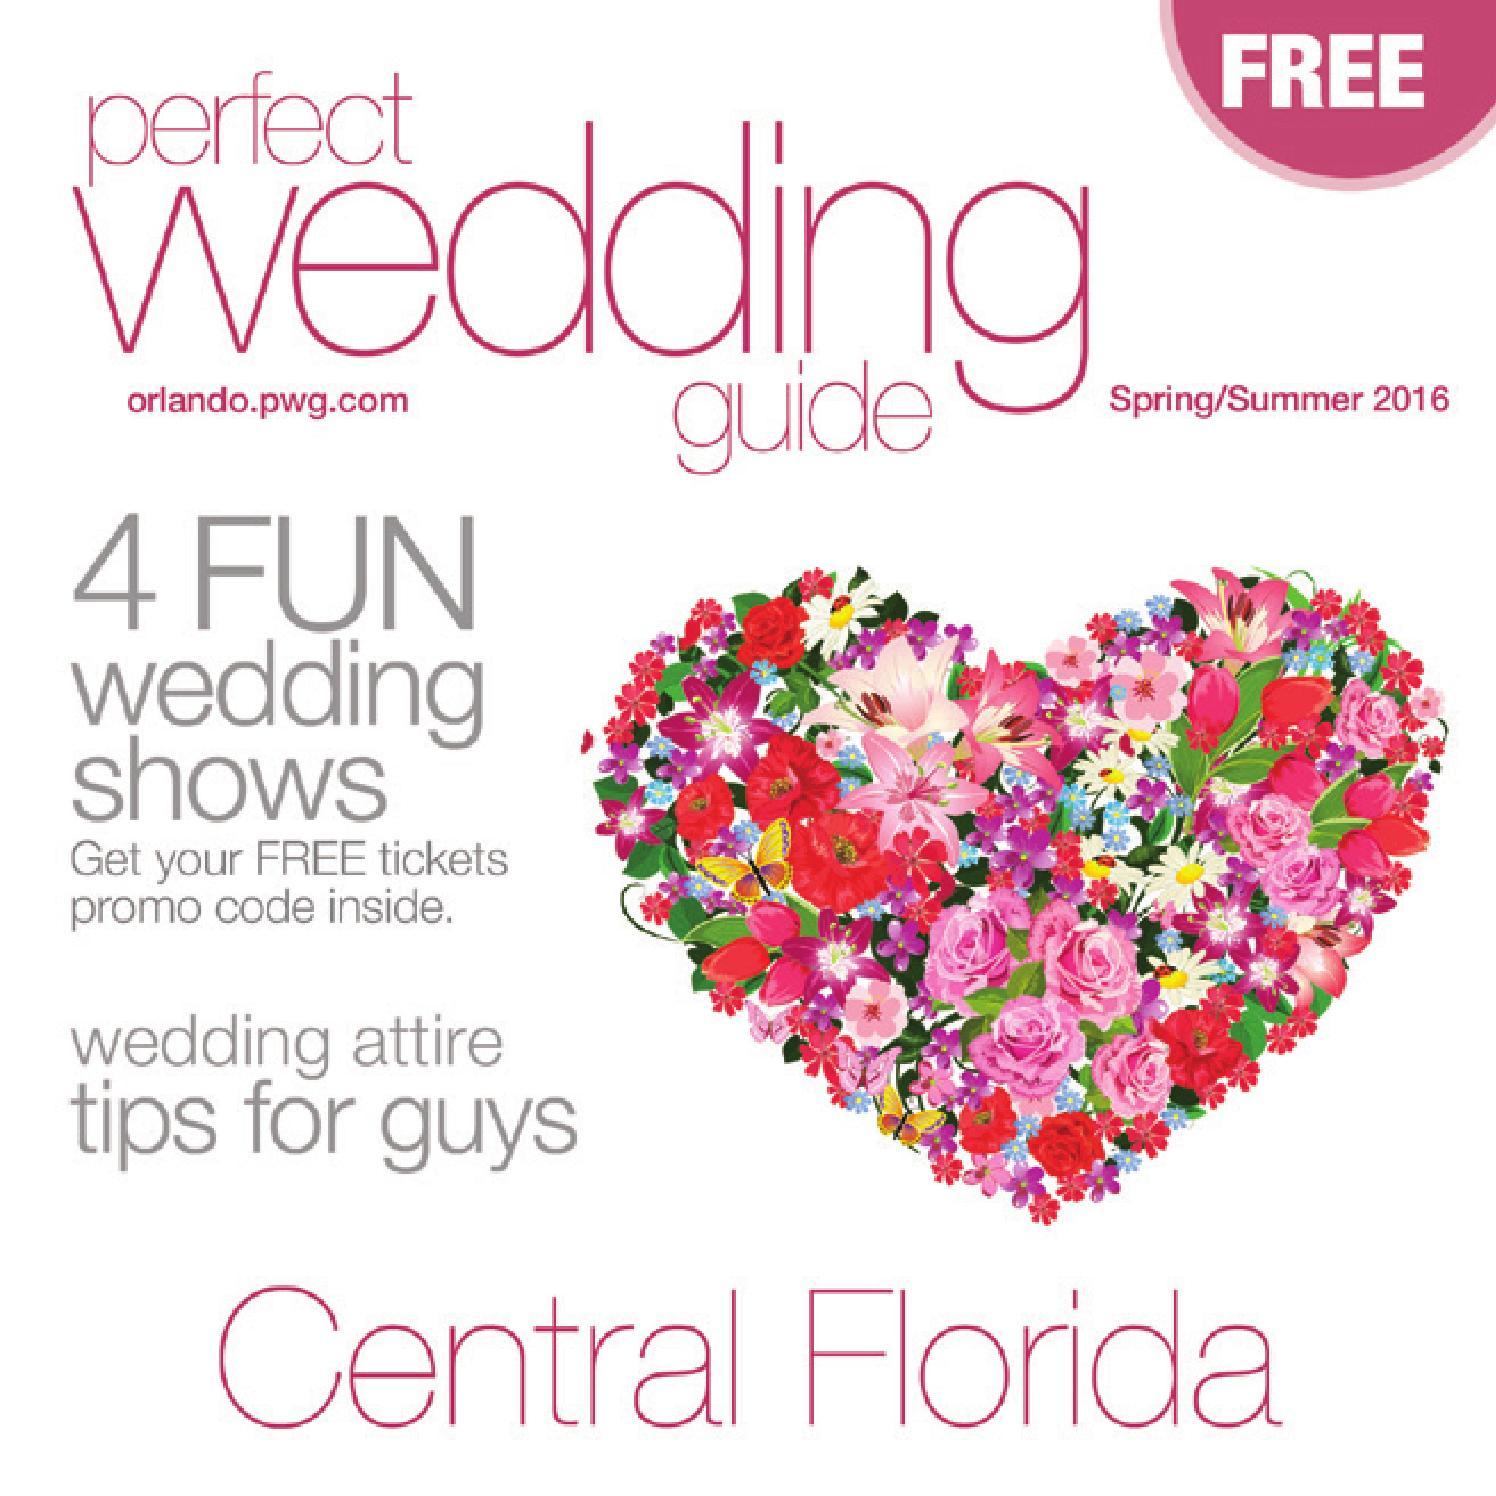 Perfect Wedding Guide Orlando Spring/Summer 2016 by Rick Caldwell ...